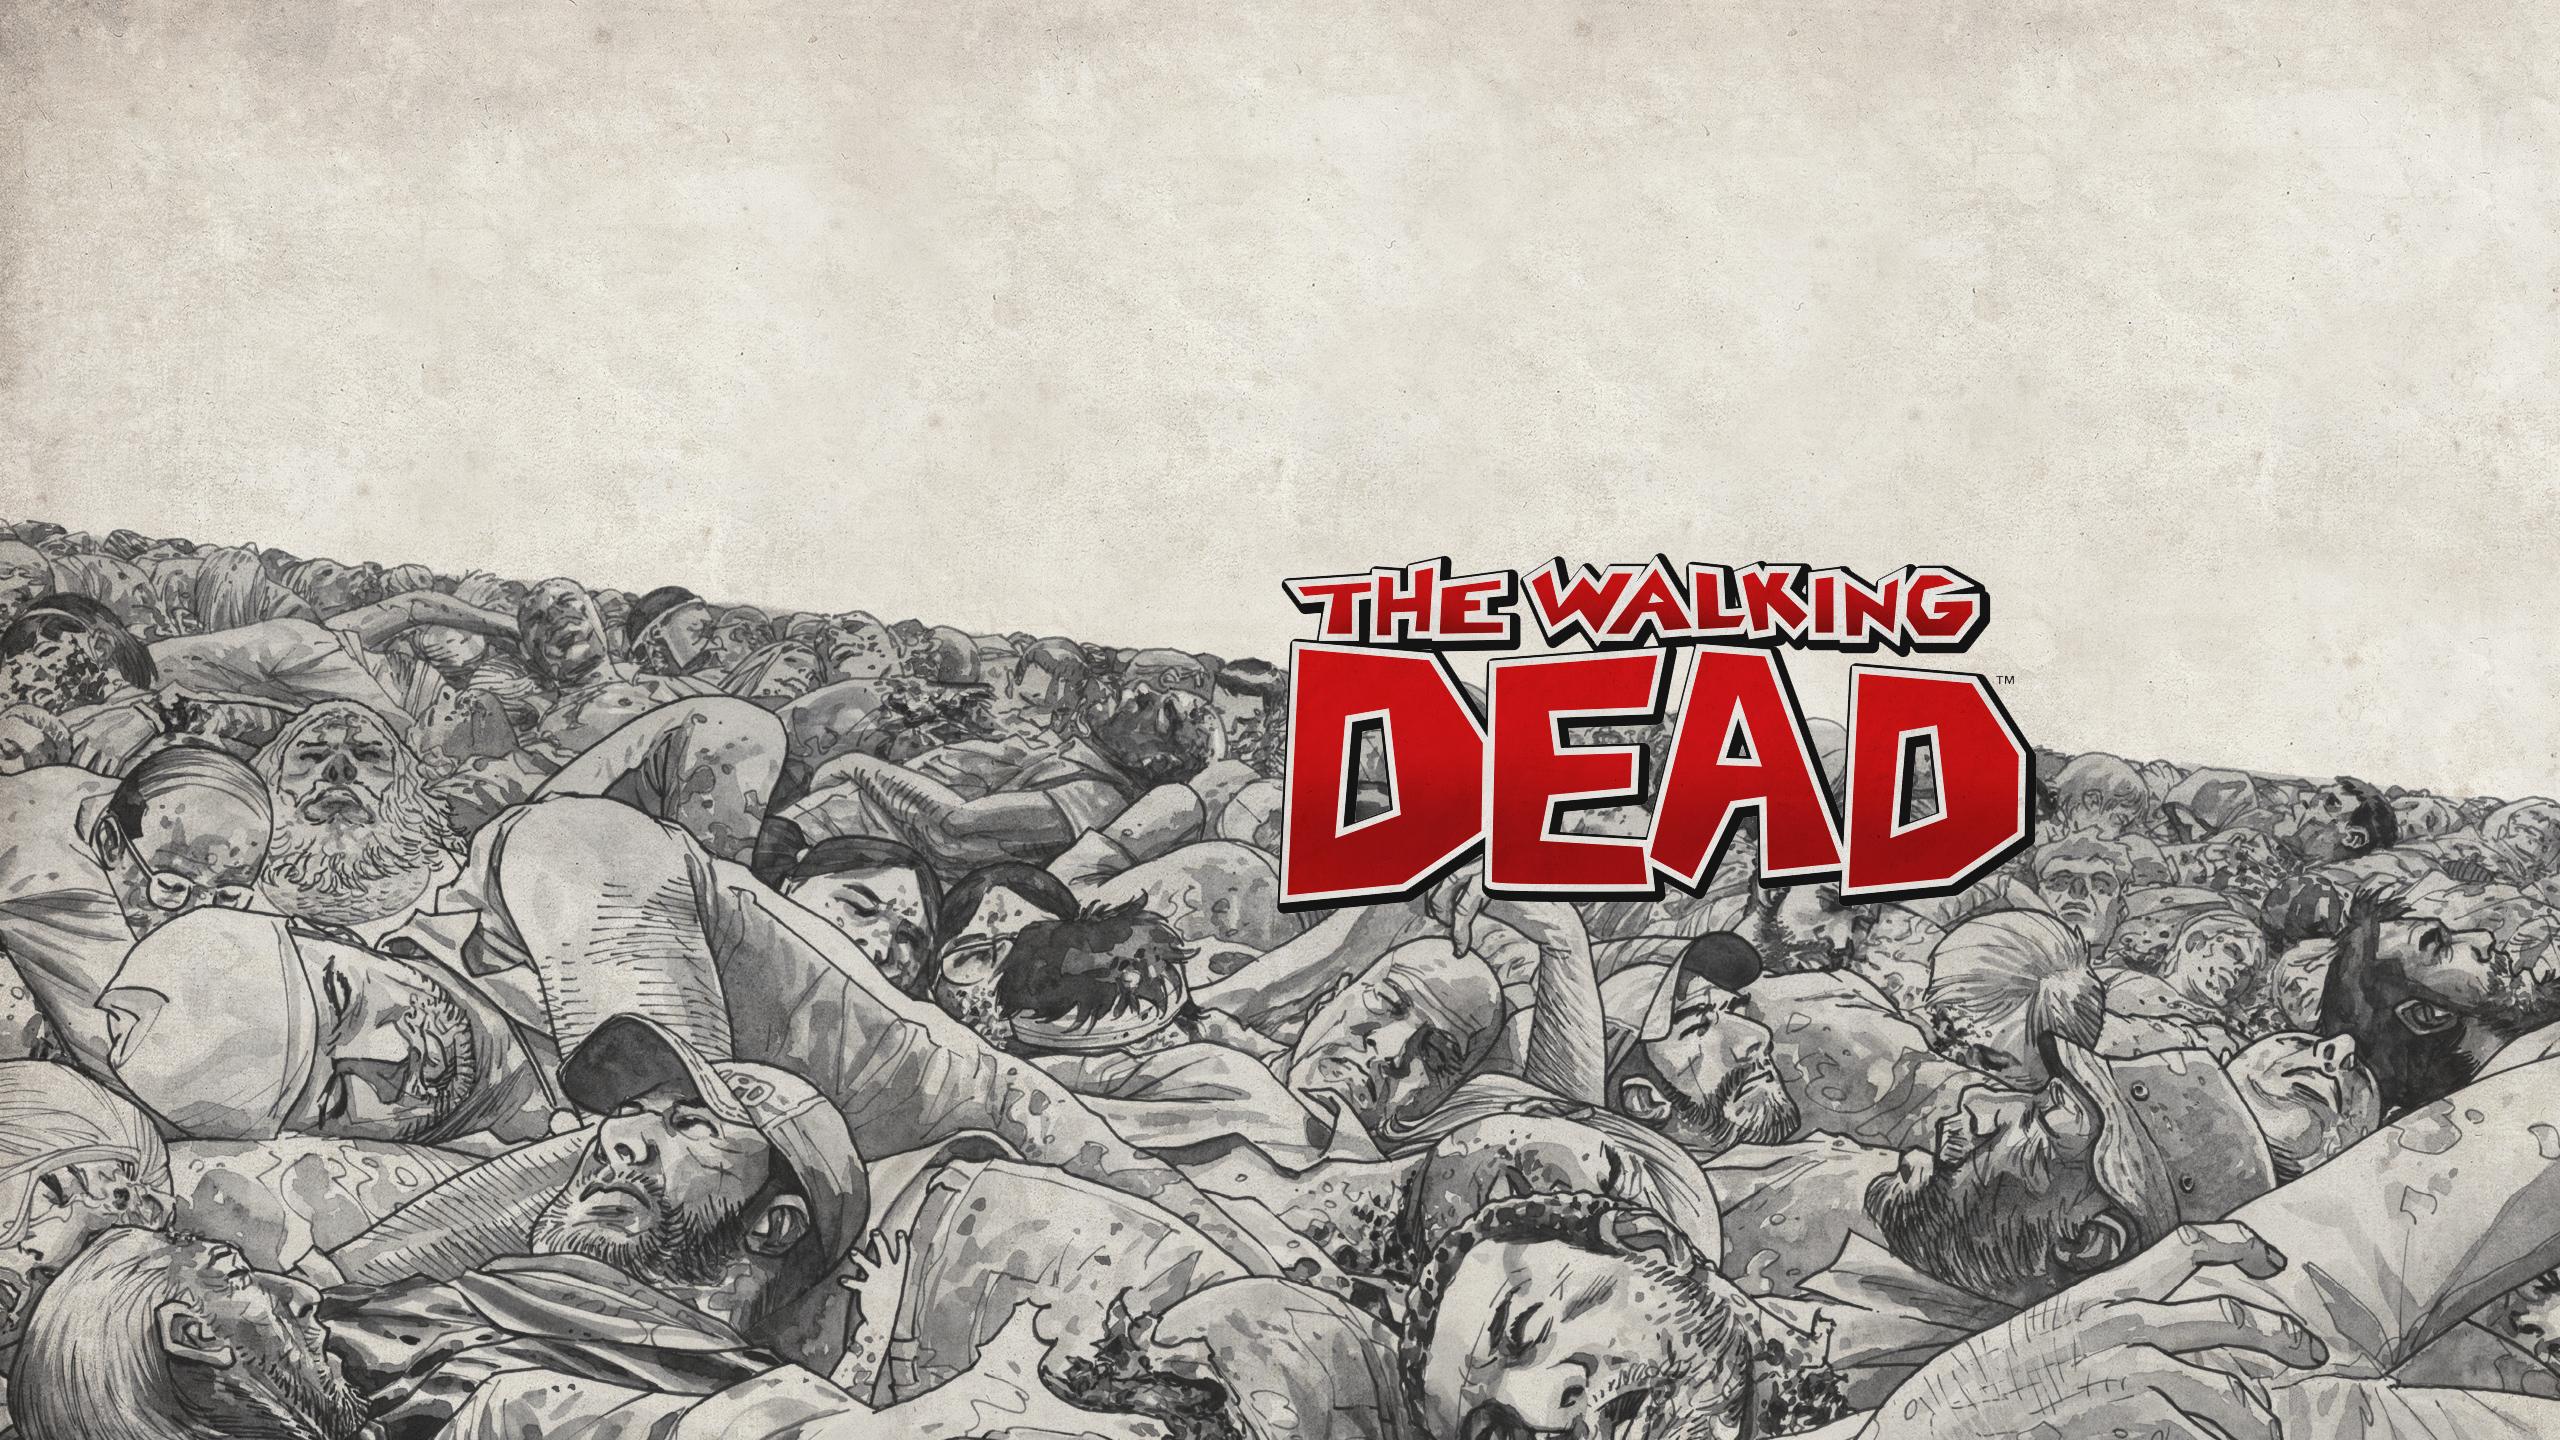 The Walking Dead Hd Wallpaper Background Image 2560x1440 Id